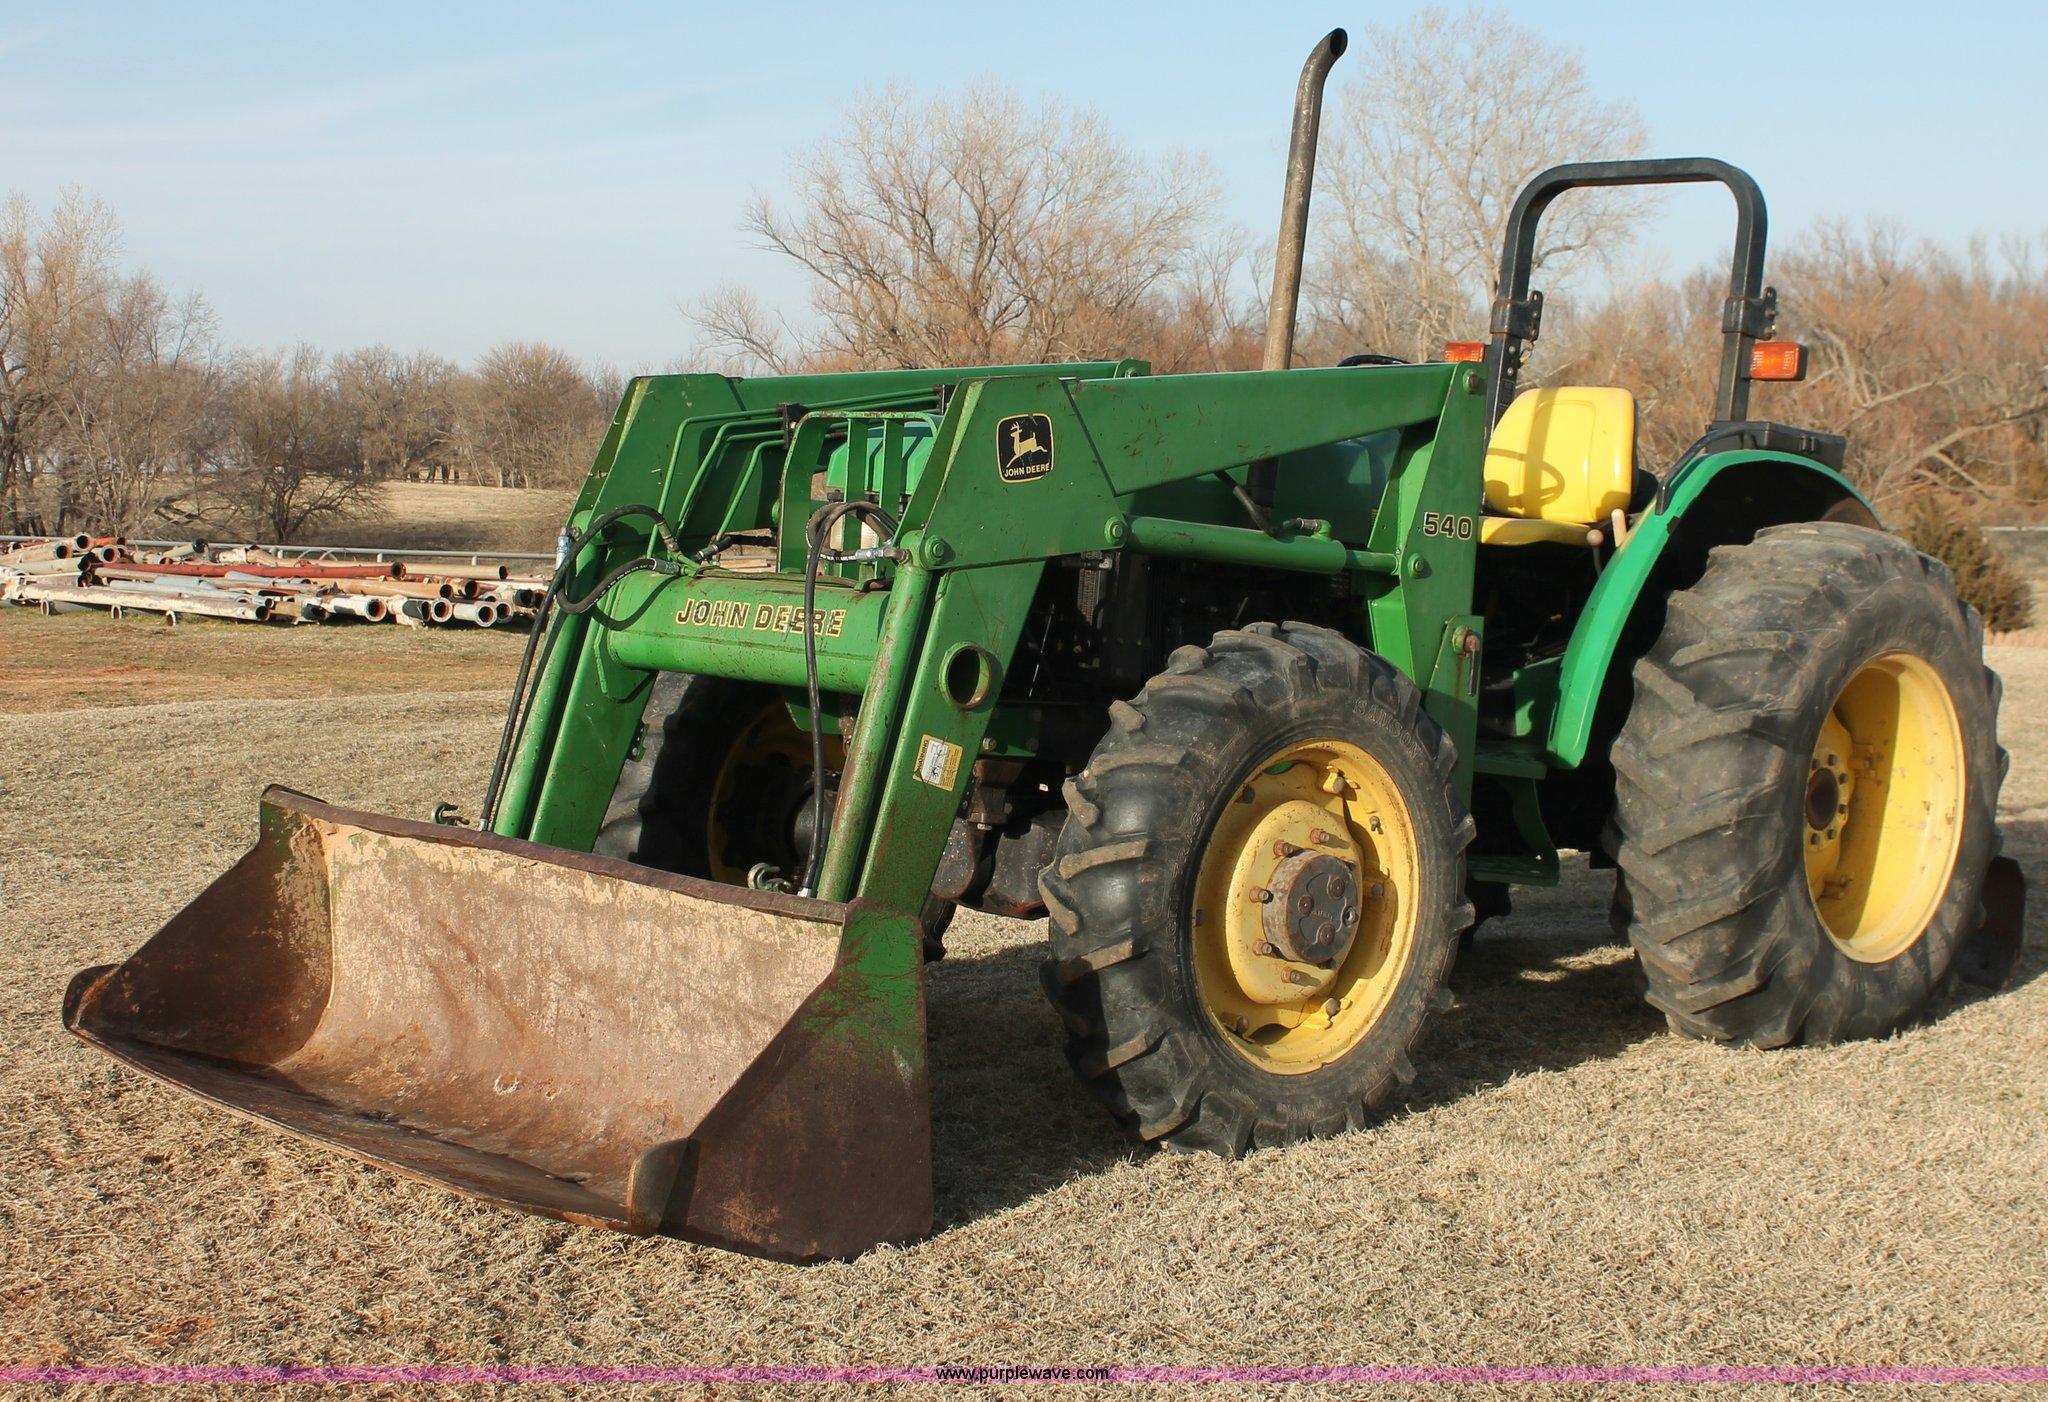 1992 John Deere 5200 Mfwd Tractor Item Ao9482 Sold Apri. Ao9482 For Item 1992 John Deere 5200. John Deere. John Deere 5200 Diagram At Scoala.co